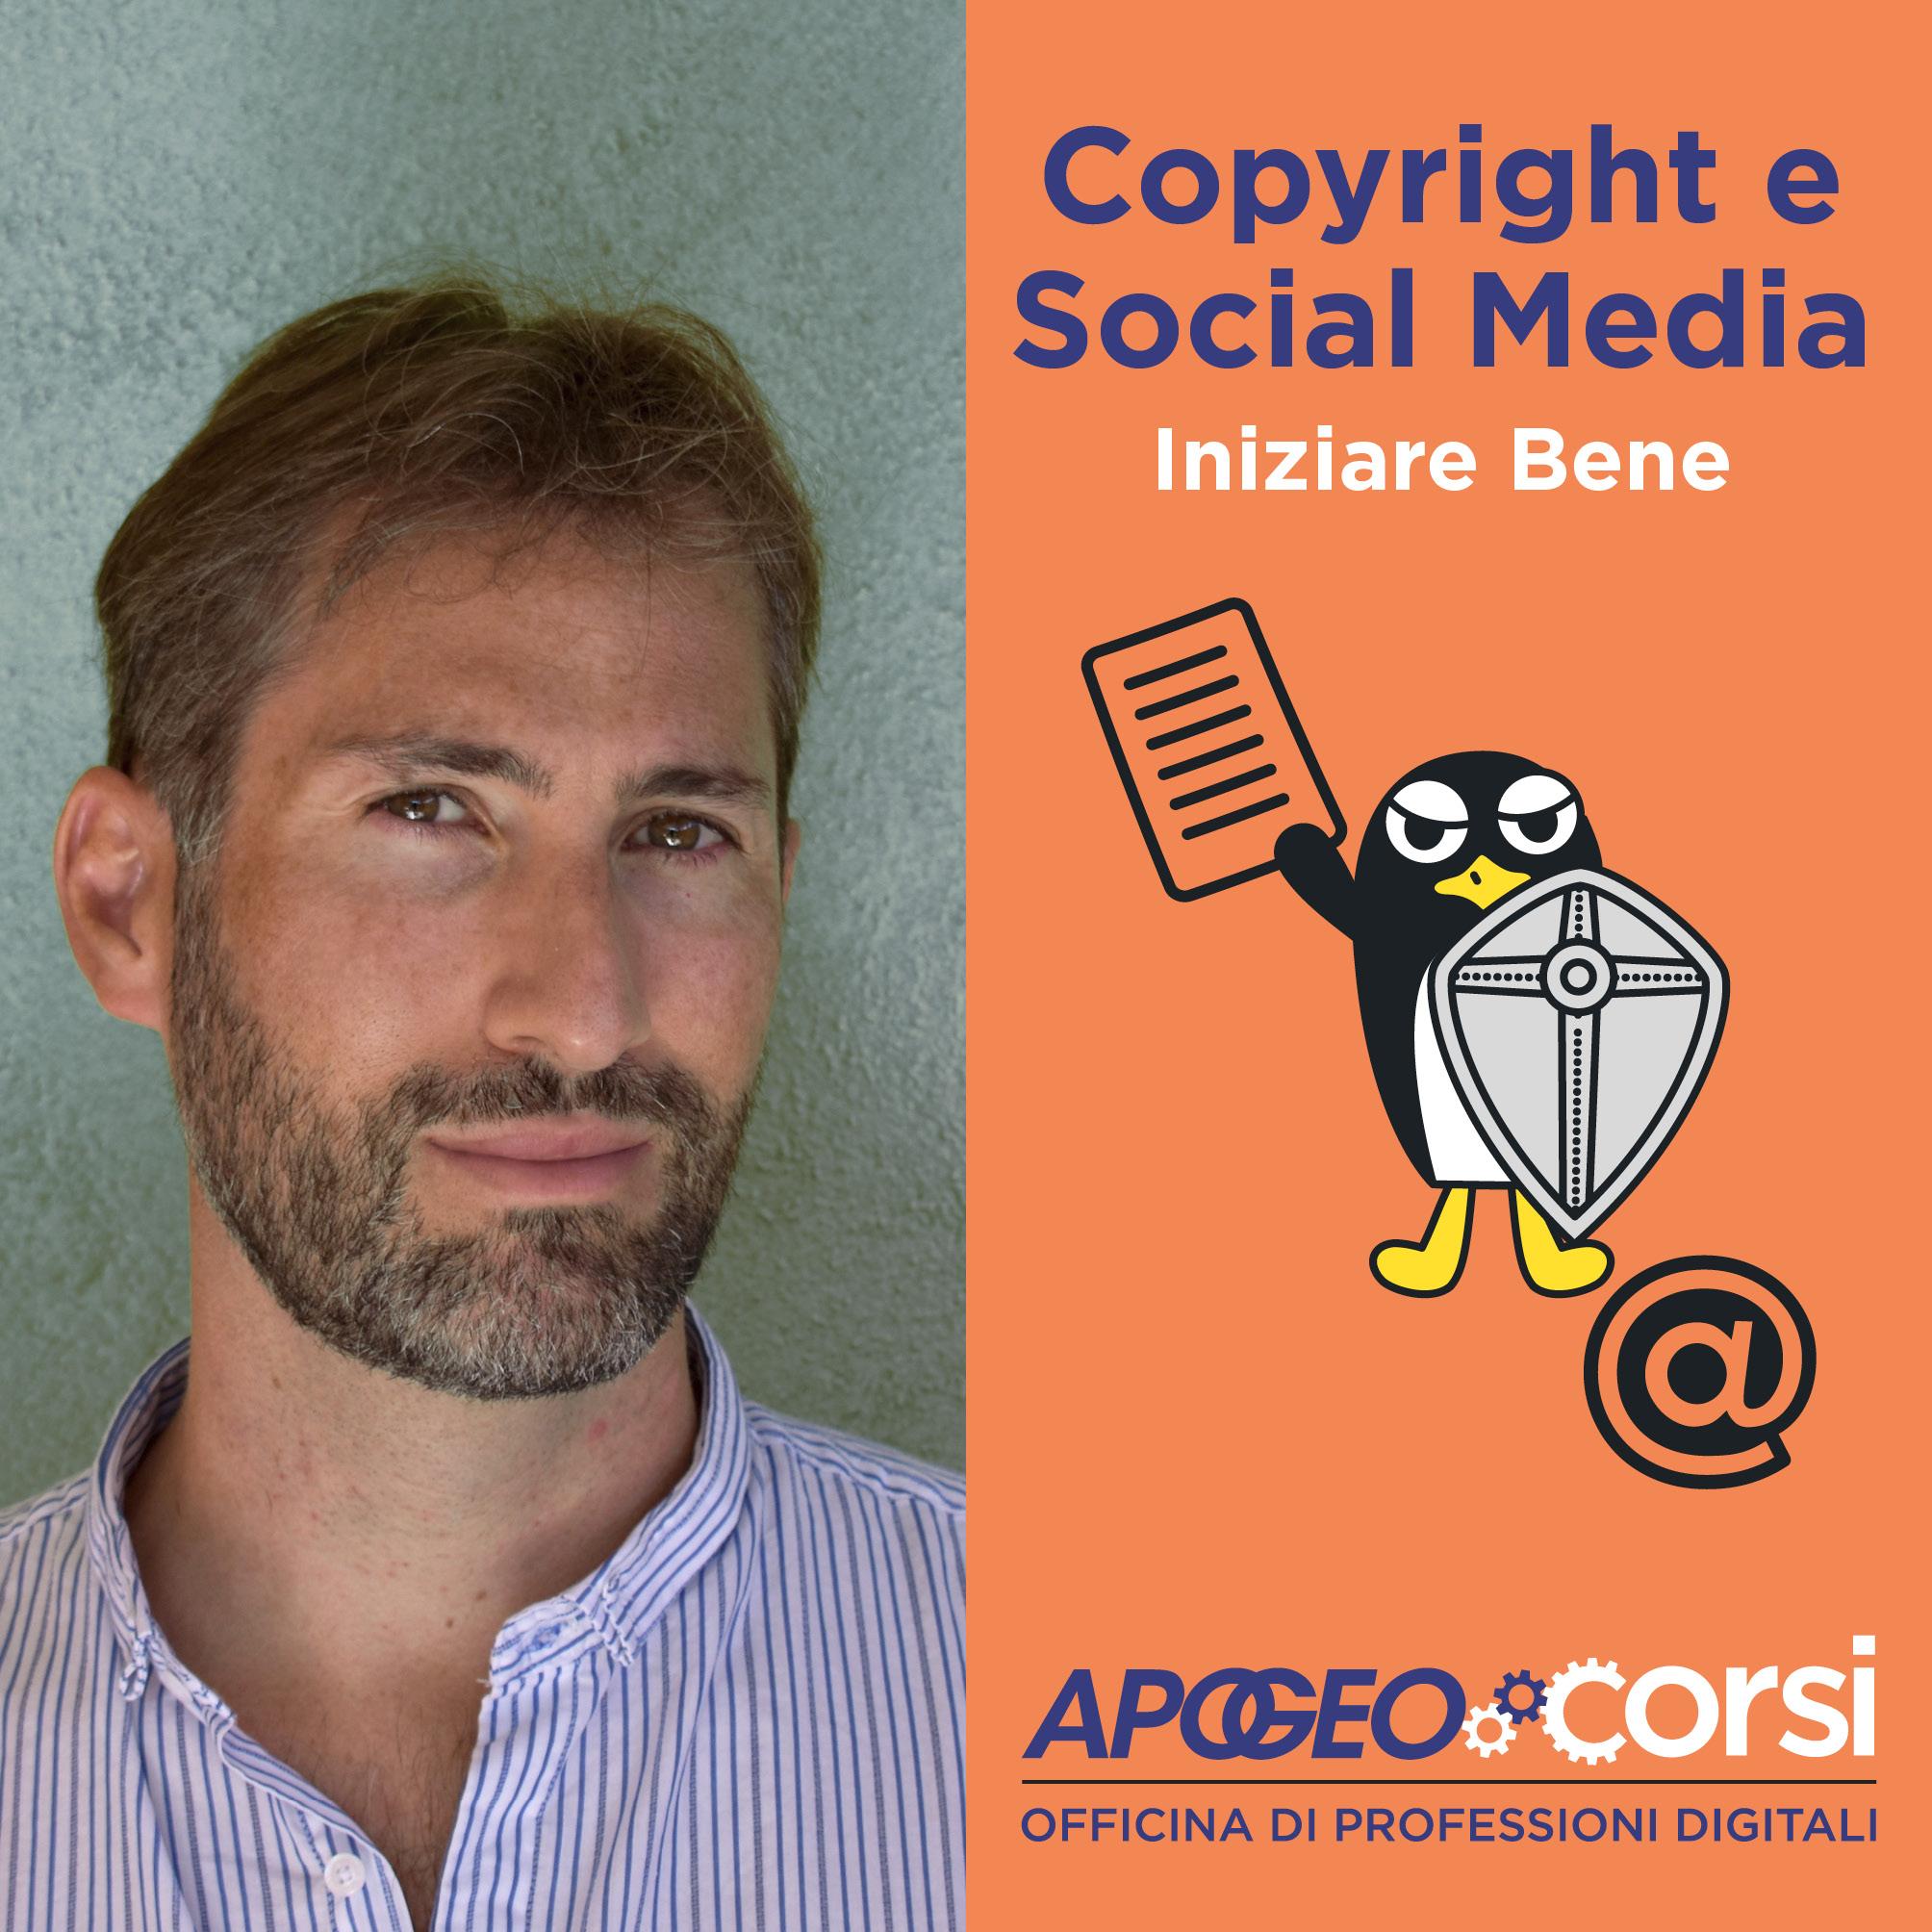 Copyright-e-social-media-iniziare-bene-cover